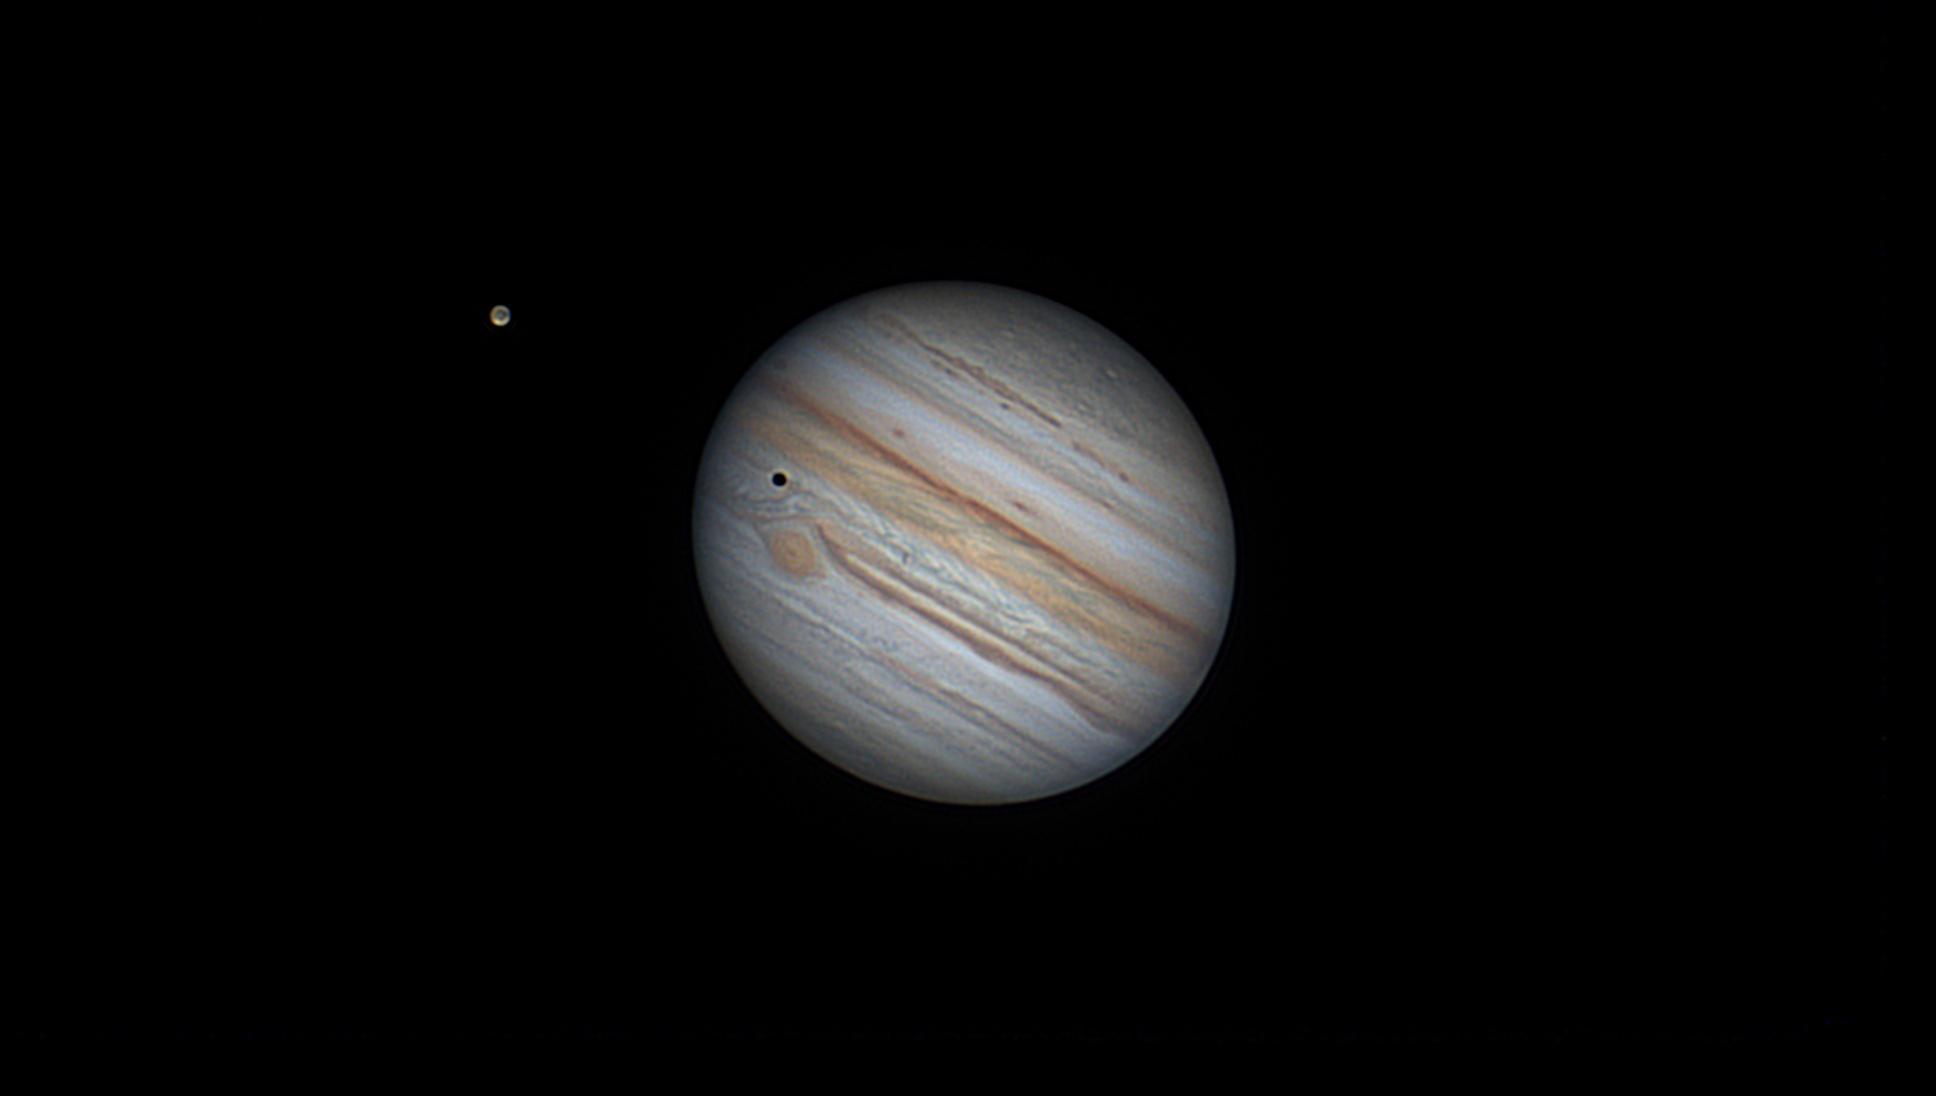 61360120e7164_2021-09-05-2323_2-Jupiter_lapl5_ap499_convdo.jpg